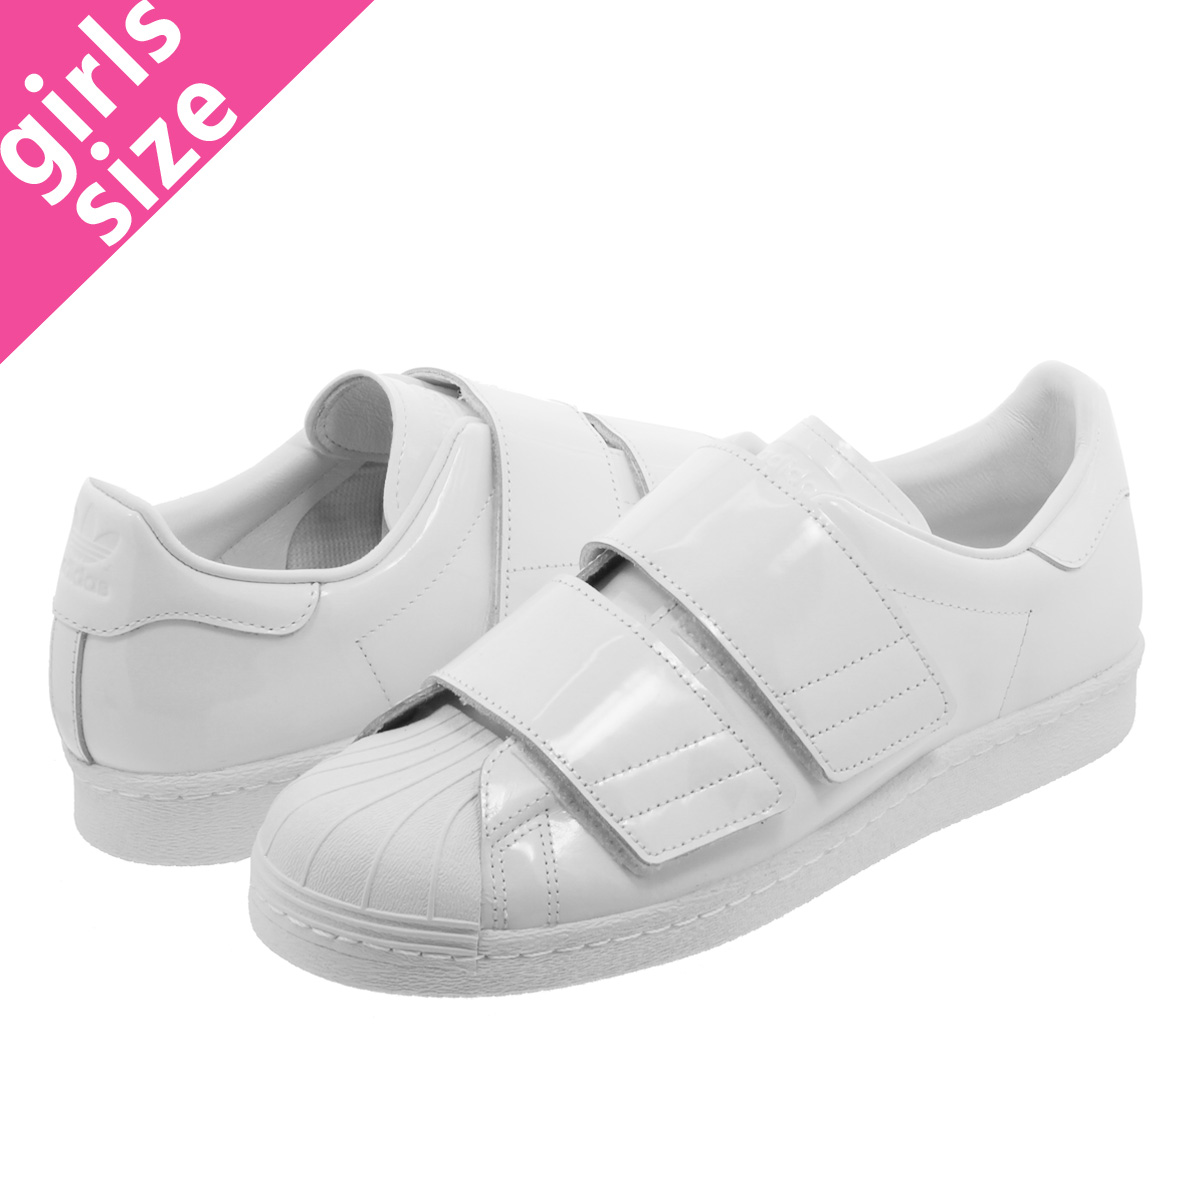 adidas SUPERSTAR 80s CF W Adidas superstar 80s CF W RUNNING WHITERUNNING WHITERUNNING WHITE b28045